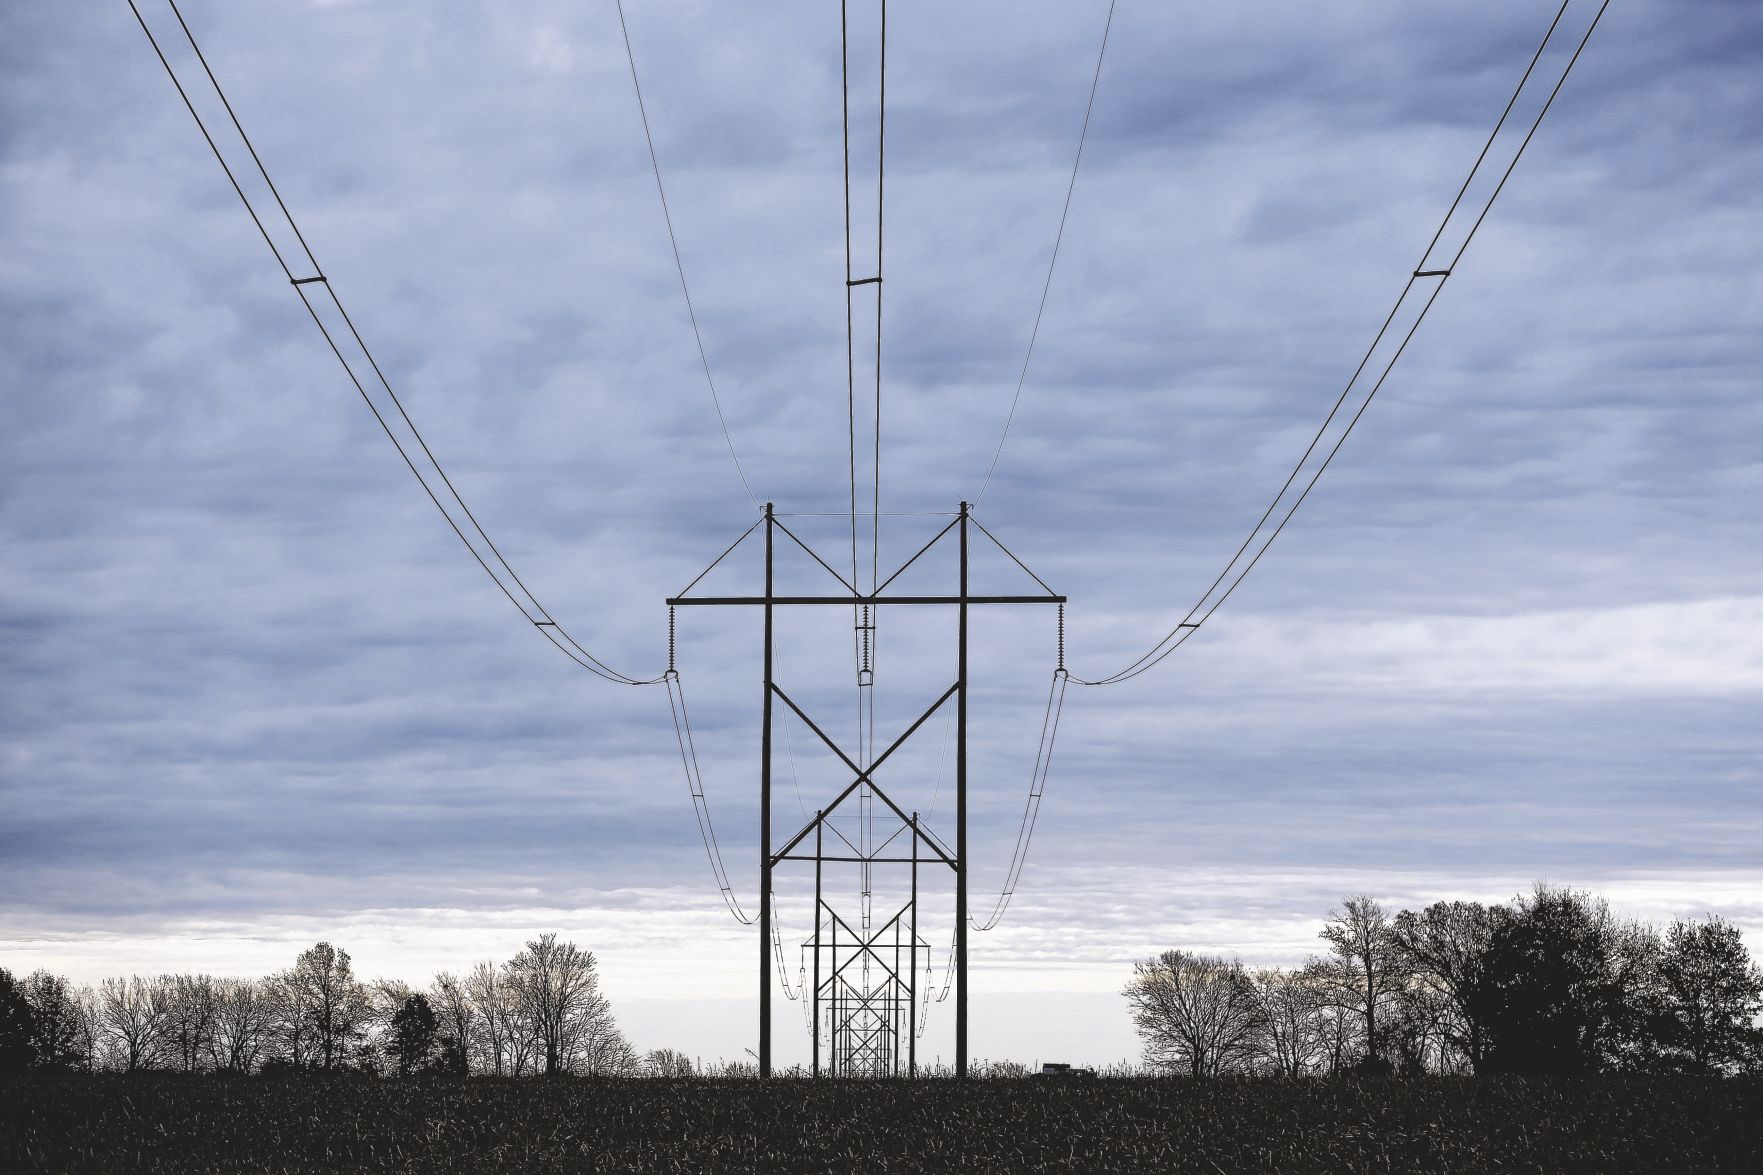 Utilities prepare for Hurricane Irma, advice for customers